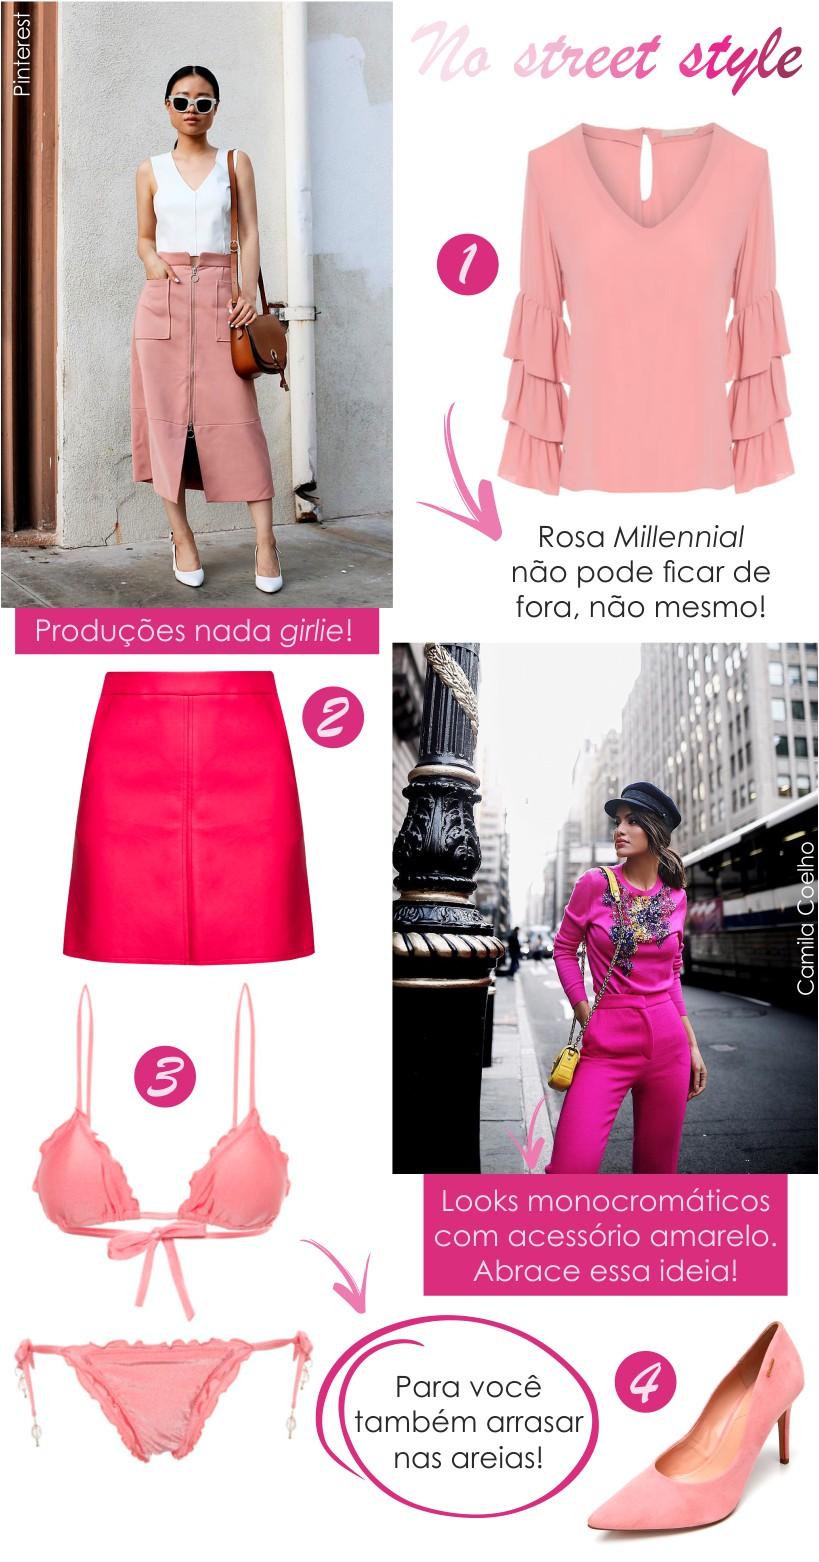 Rosa no street style